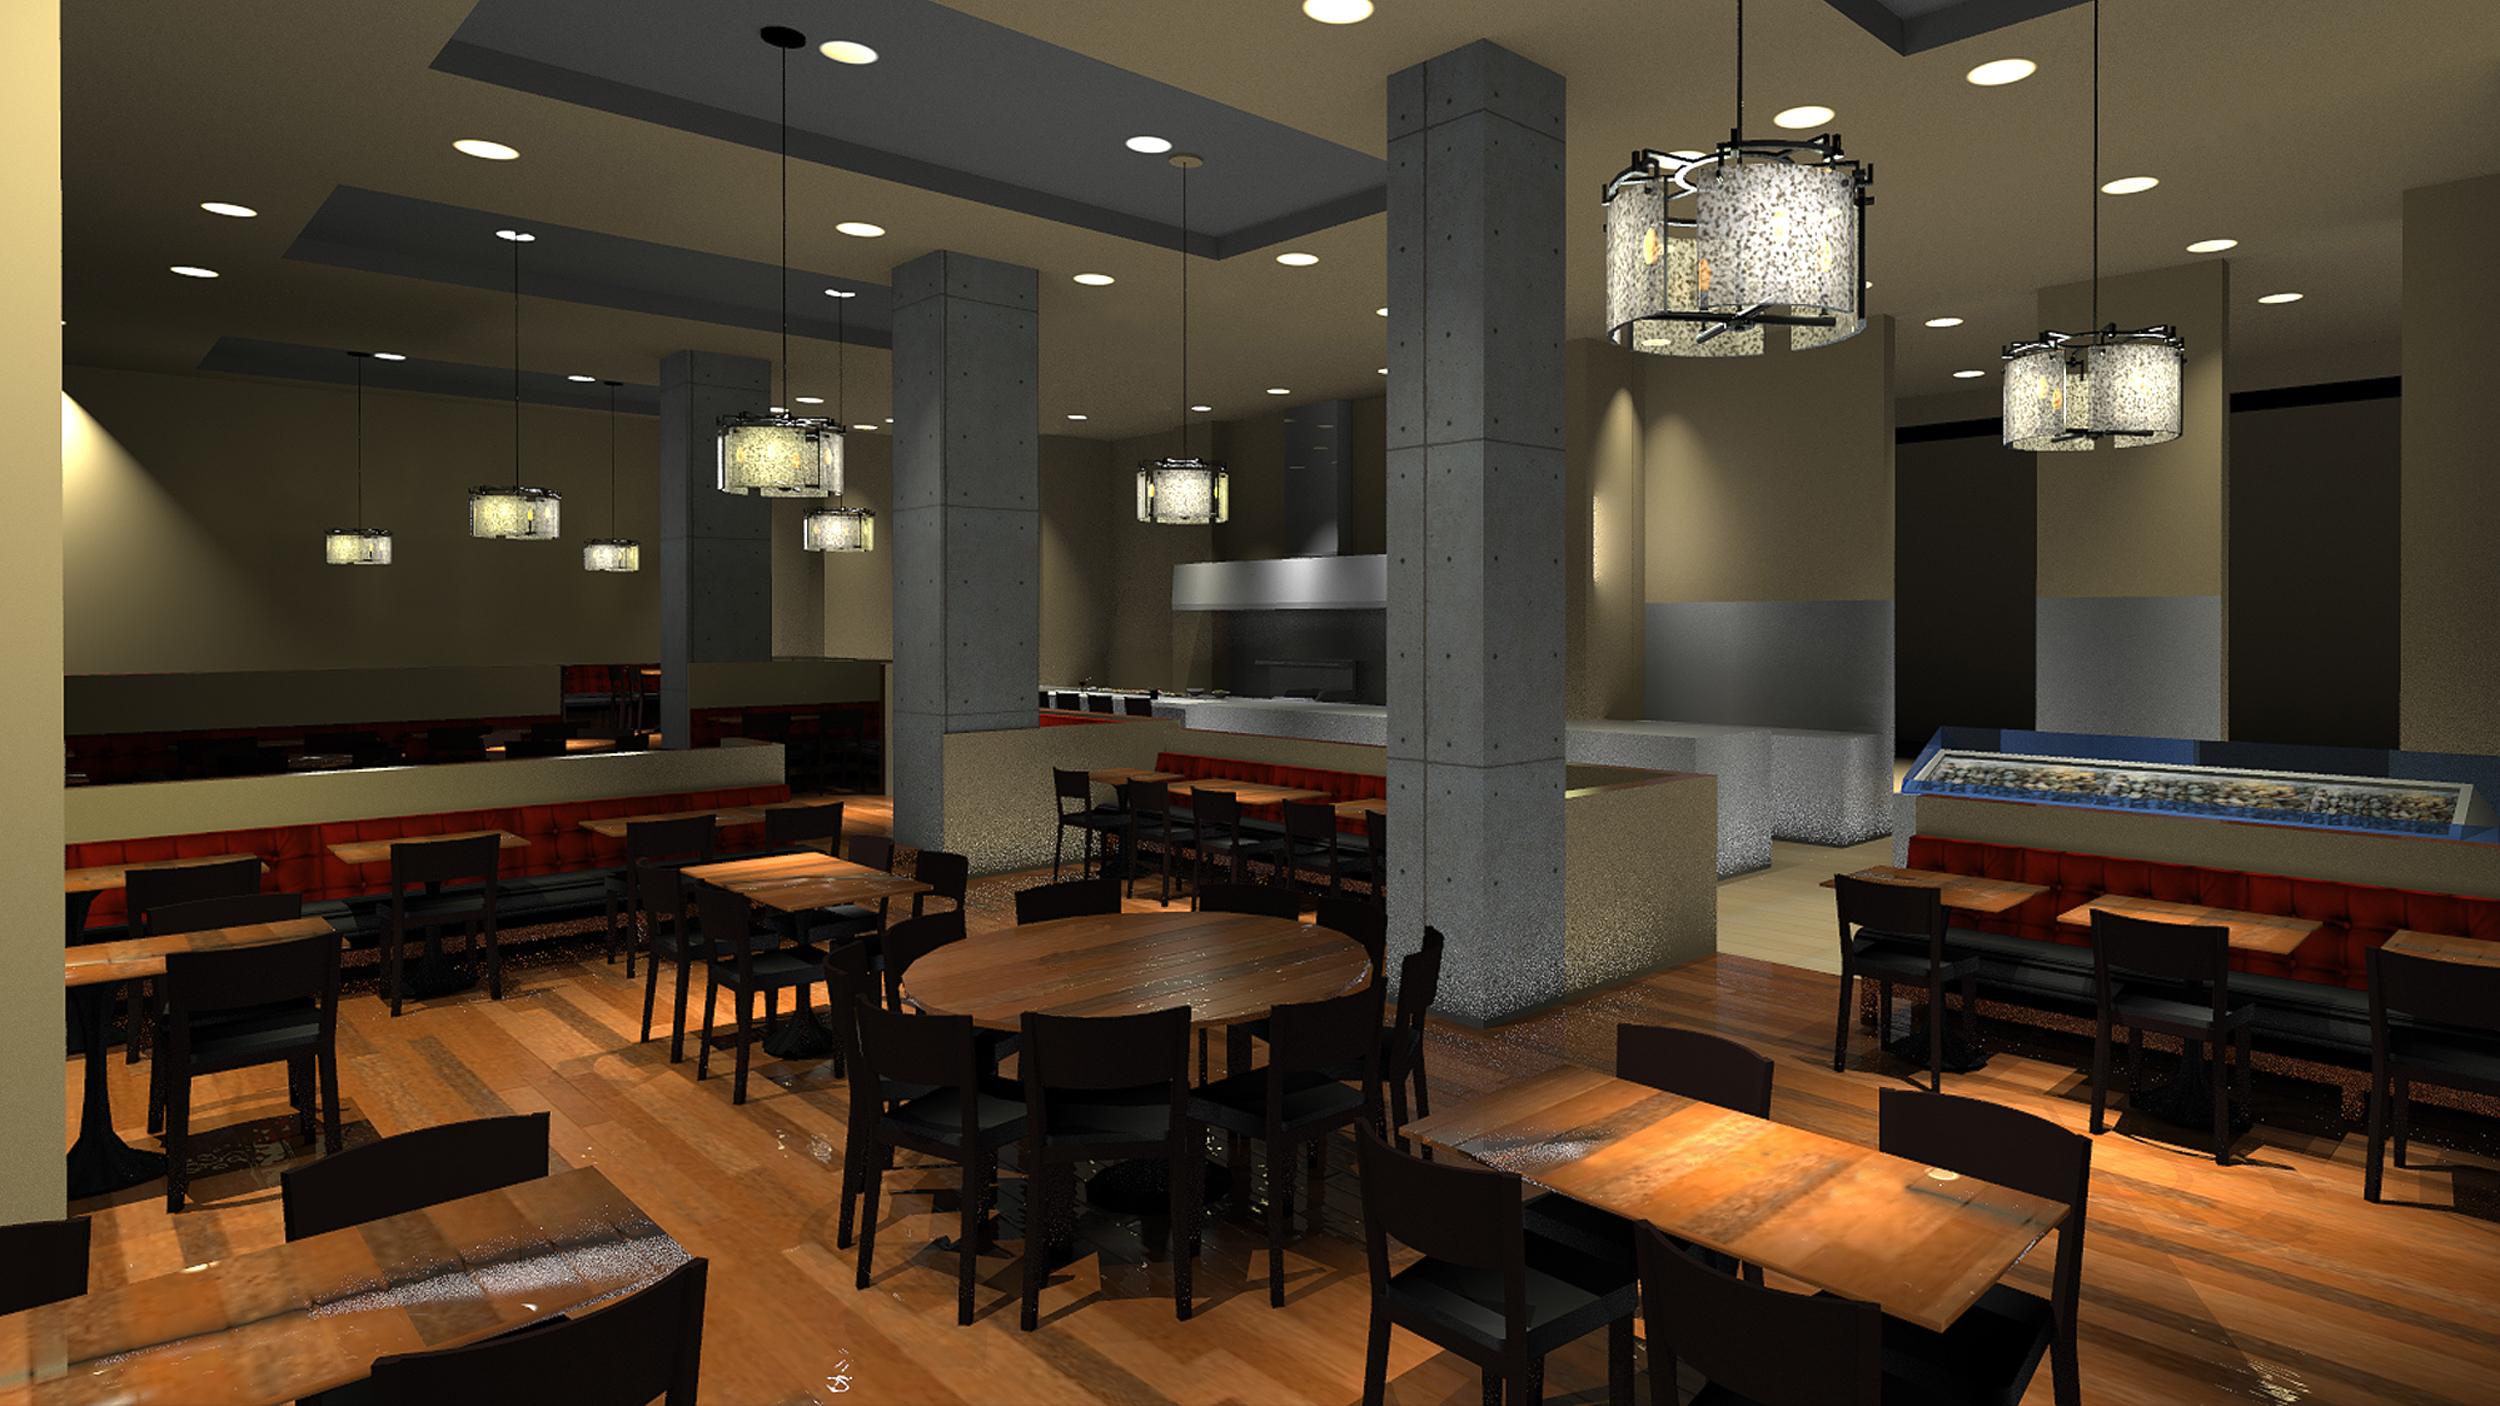 Heathman proposed Dinning Rm 3D 1.jpg